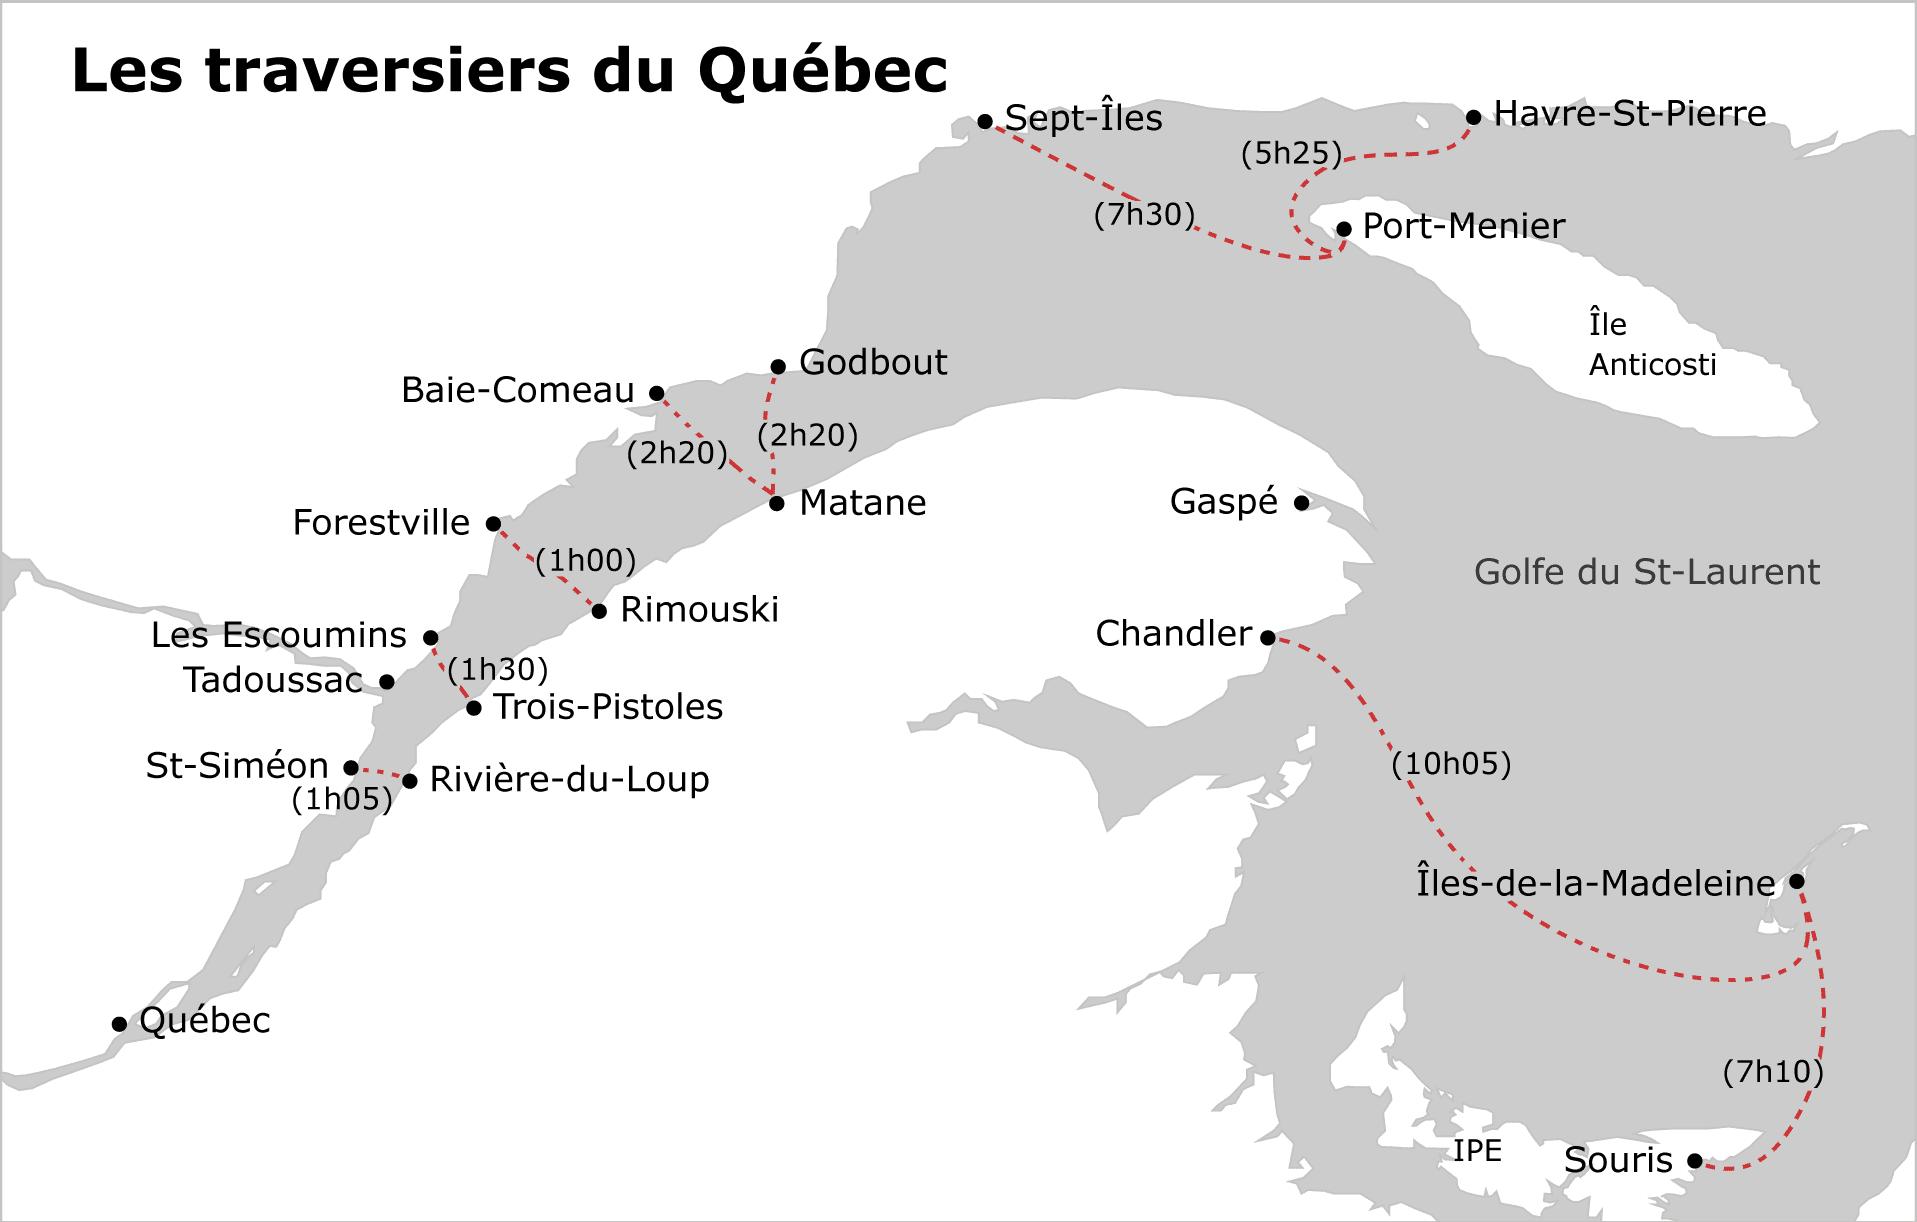 Traversiers au Québec